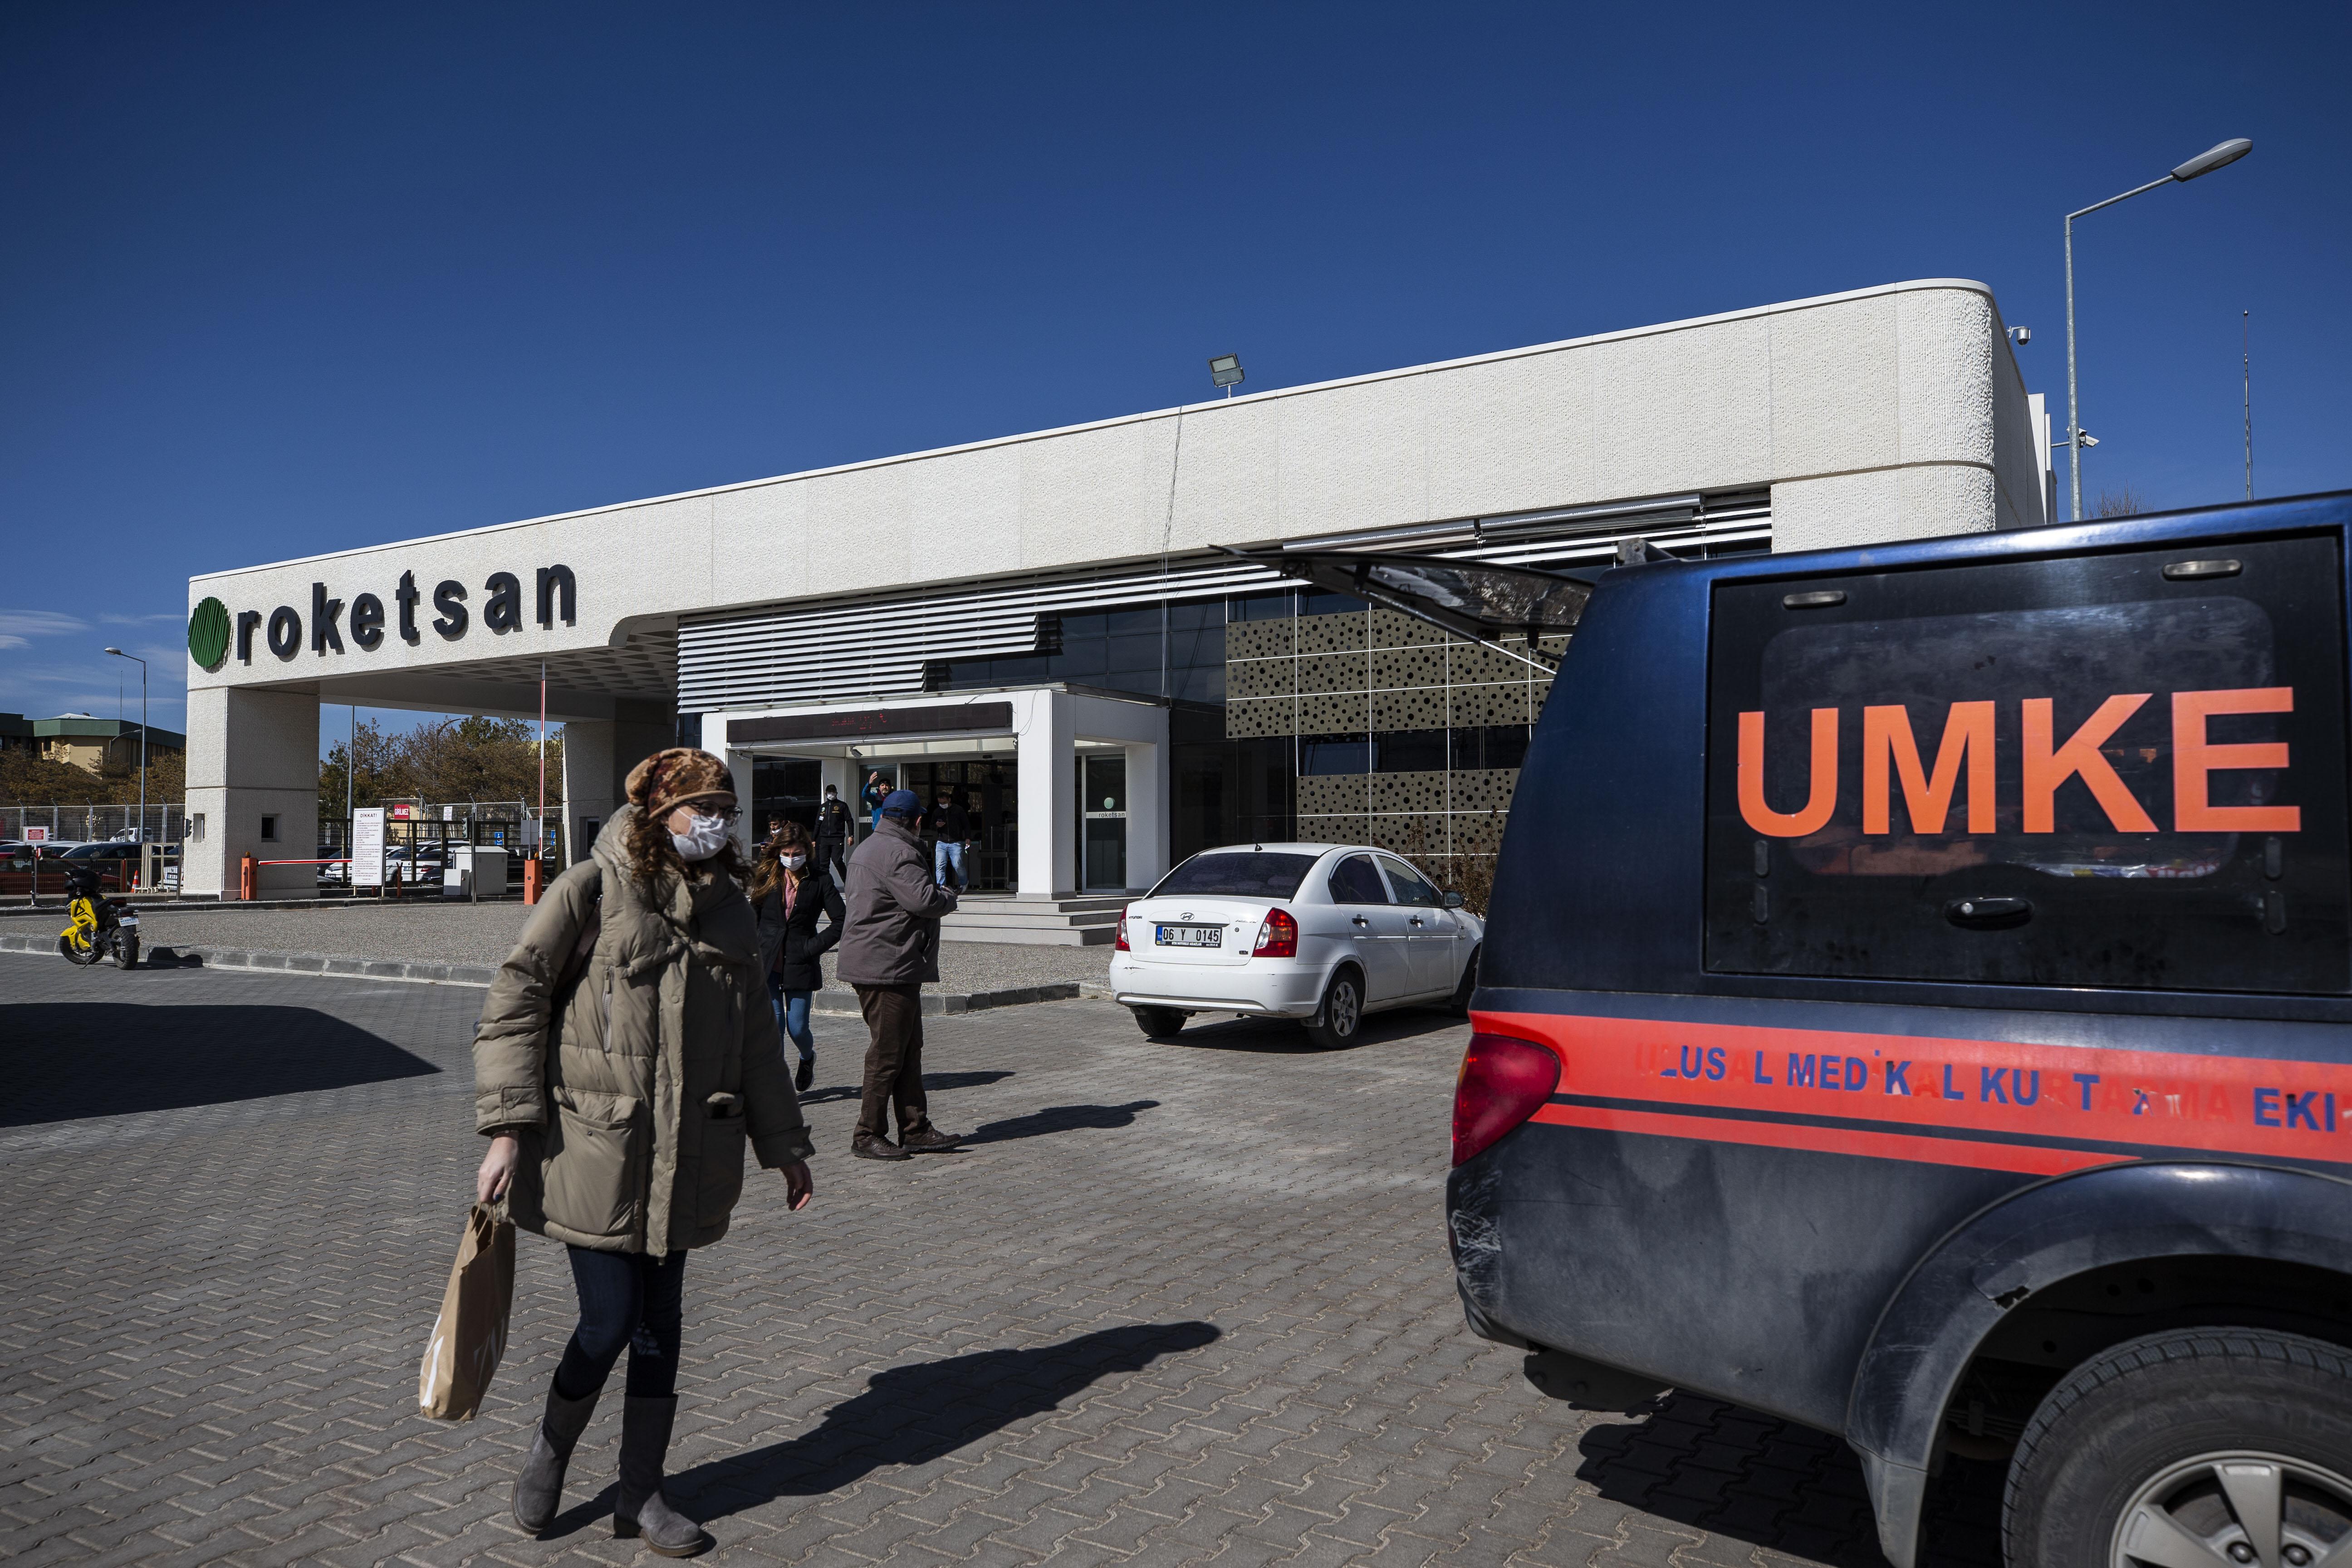 Ankara'daki Roketsan fabrikasında patlama: 3 yaralı